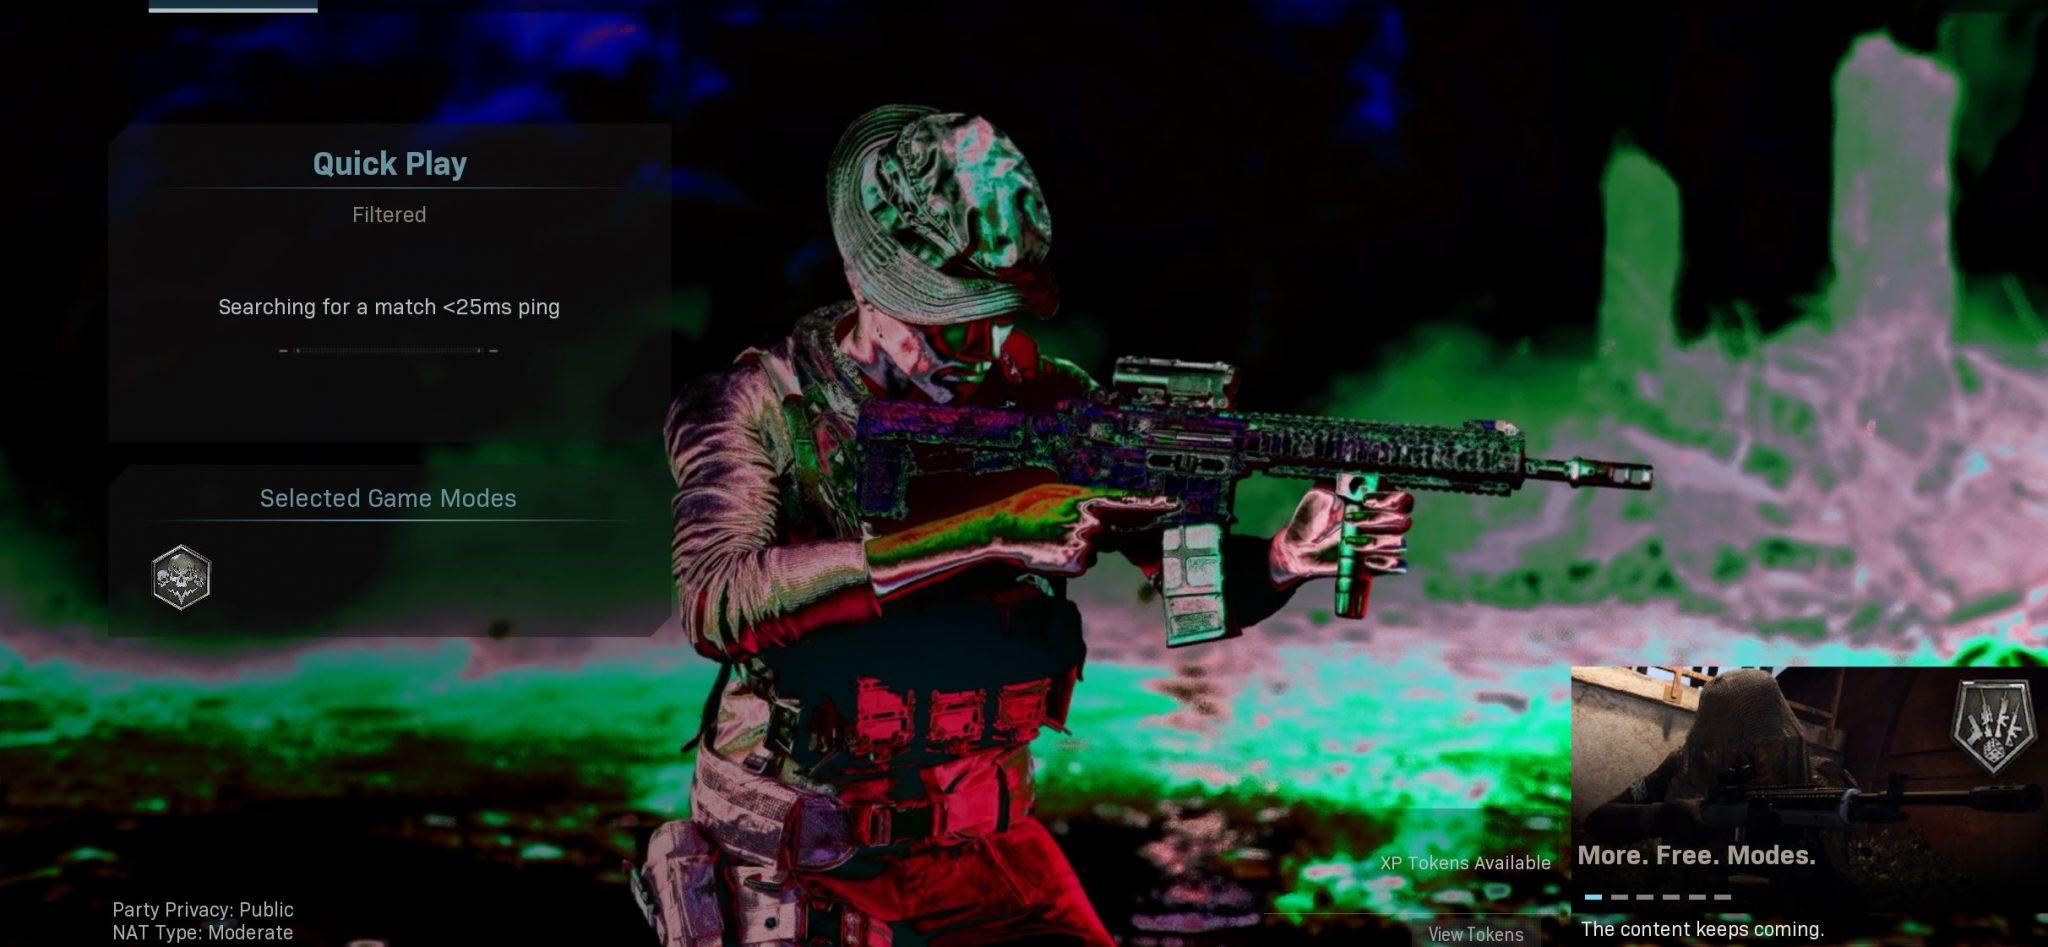 https://images.mein-mmo.de/magazin/medien/2019/12/Call-of-Duty-Modern-Warfare-Grafik-Clitch-2048x947.jpg